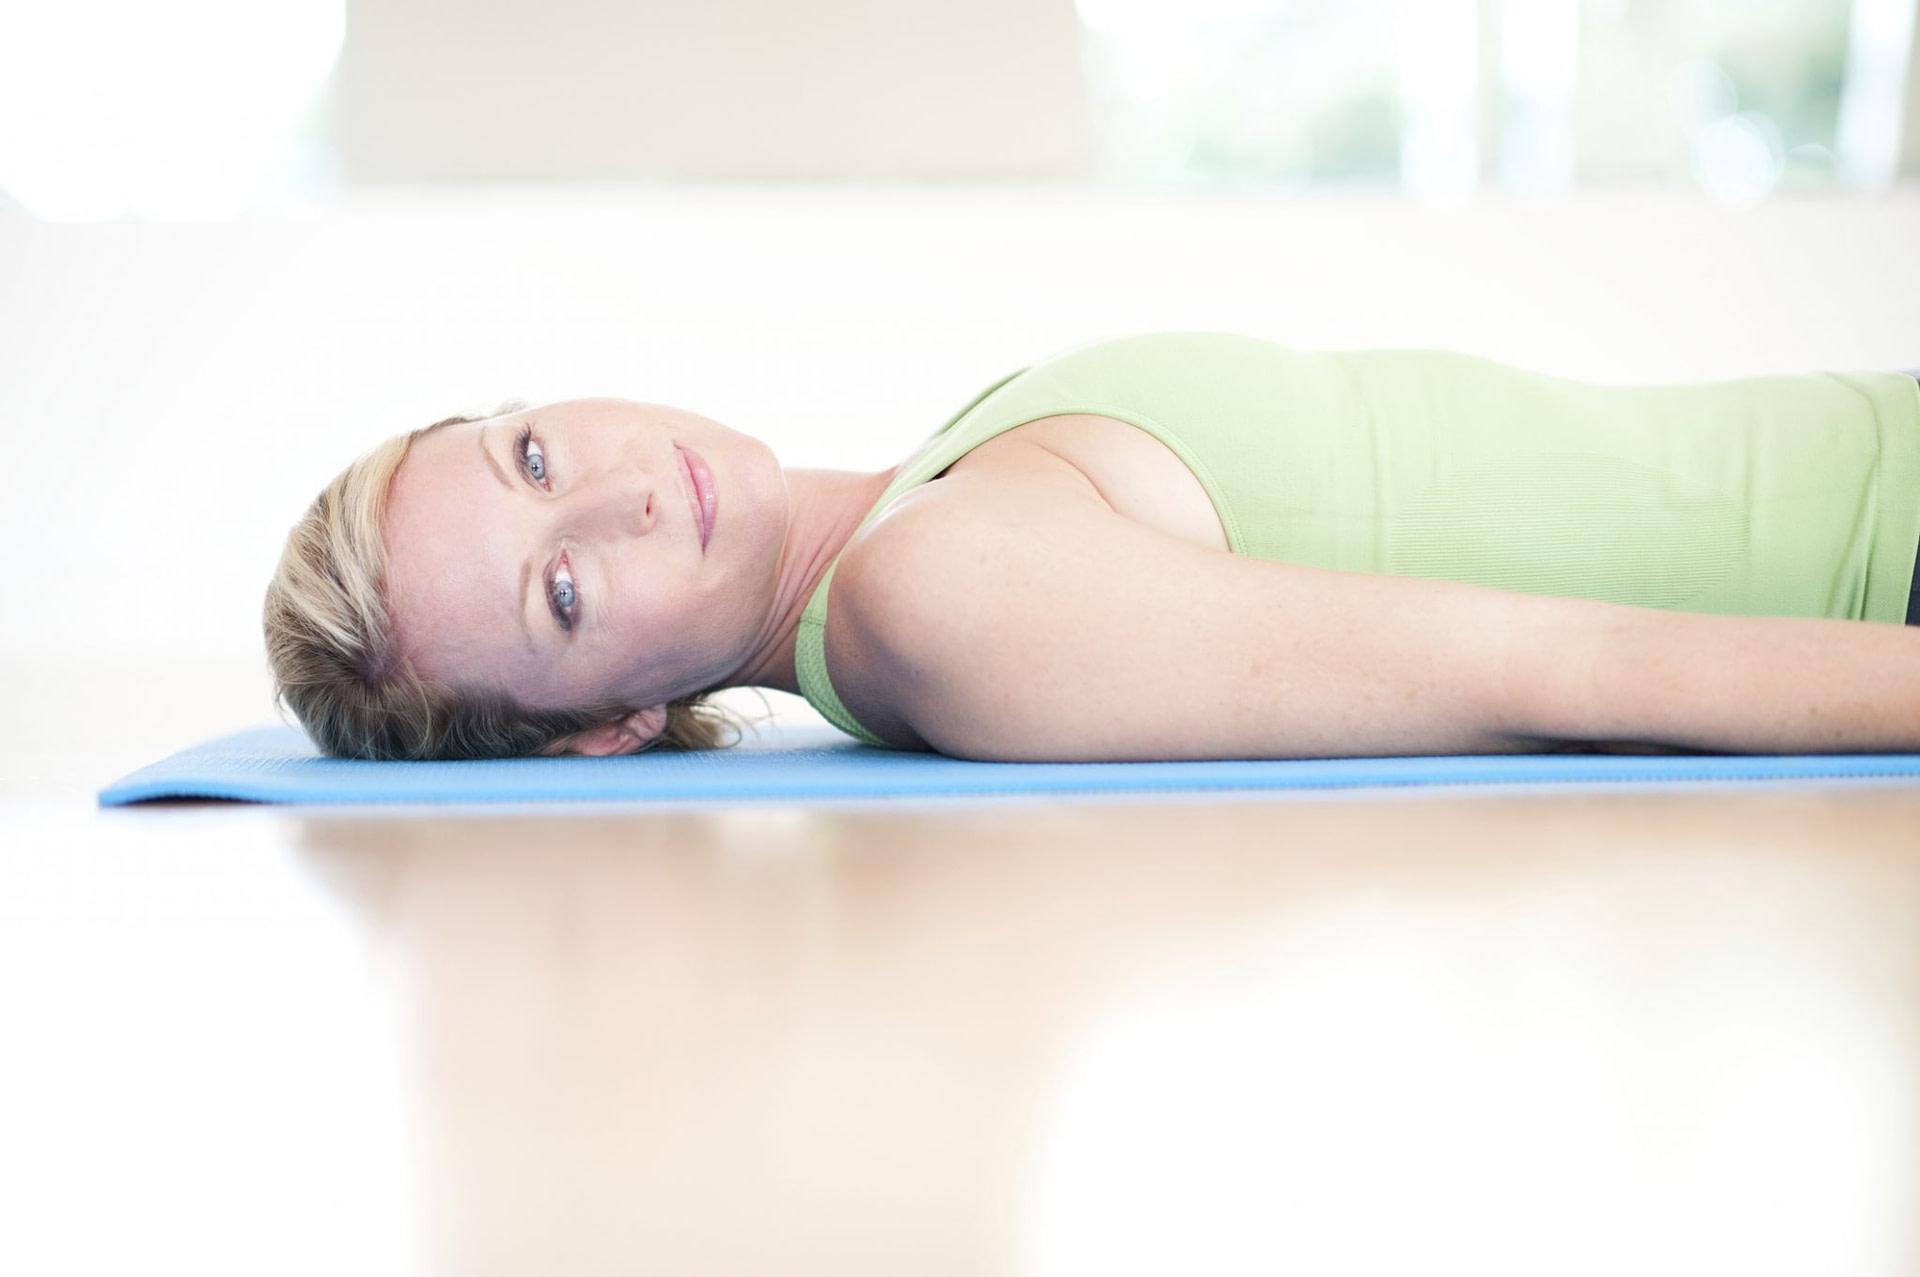 Savasana, Corpse Pose: Yoga Poses Relaxation